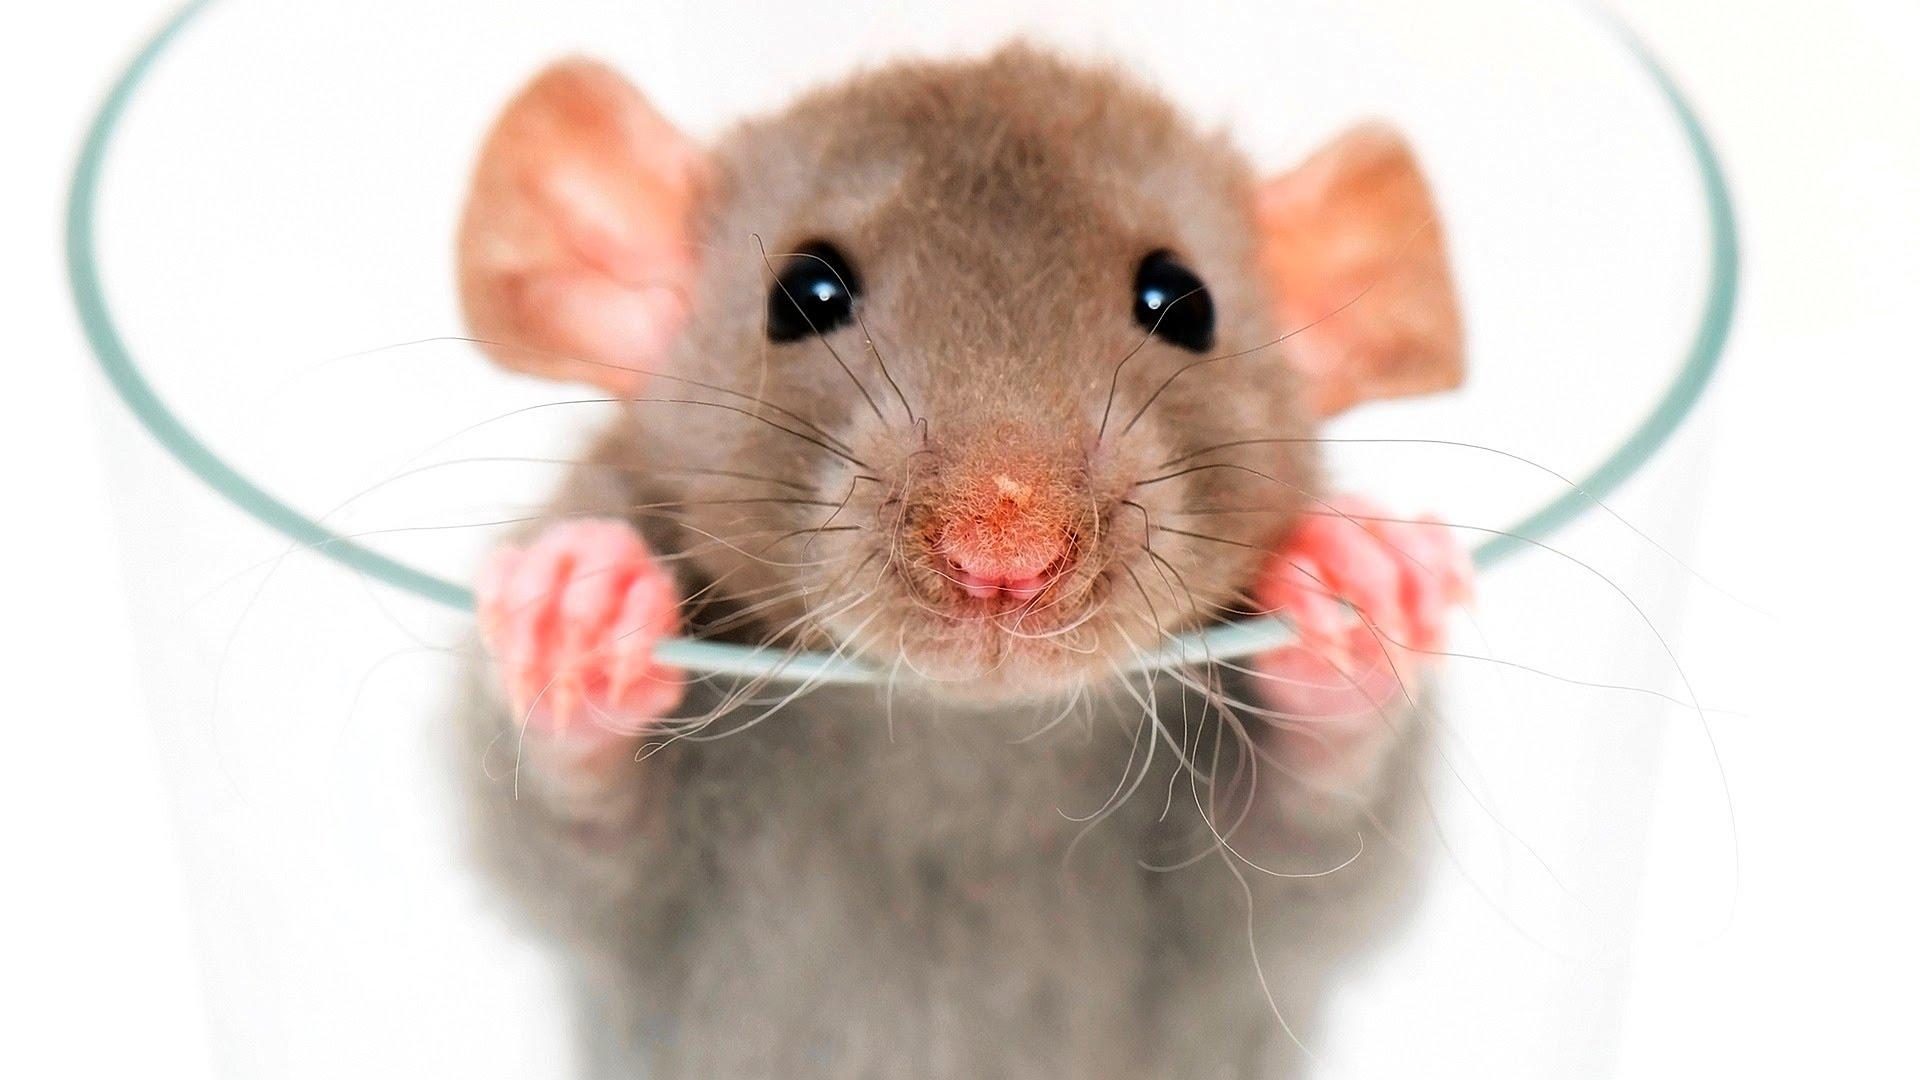 Rat Backgrounds on Wallpapers Vista